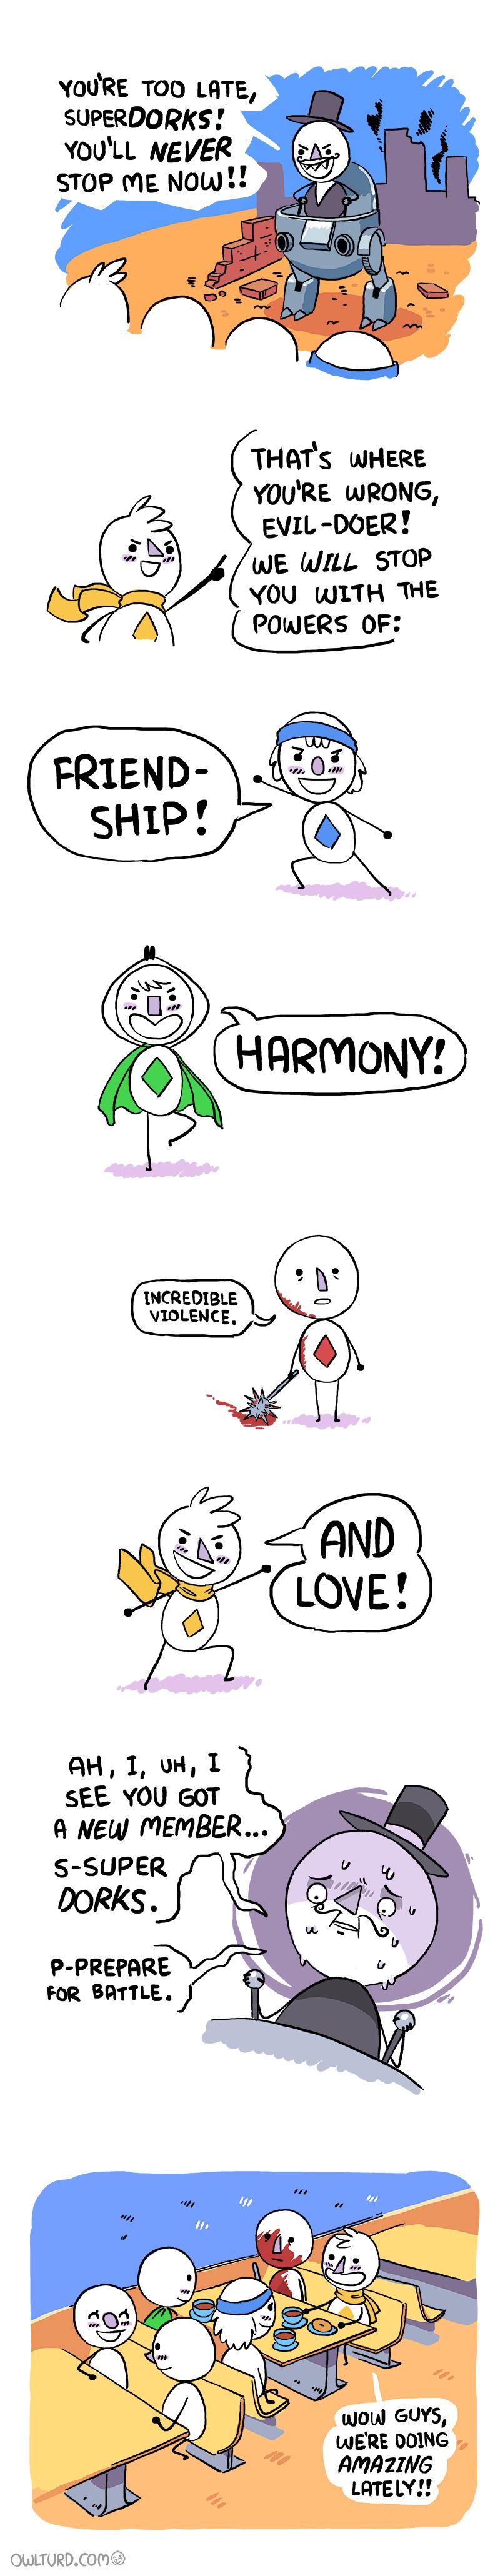 Great Teamwork Funny Meme